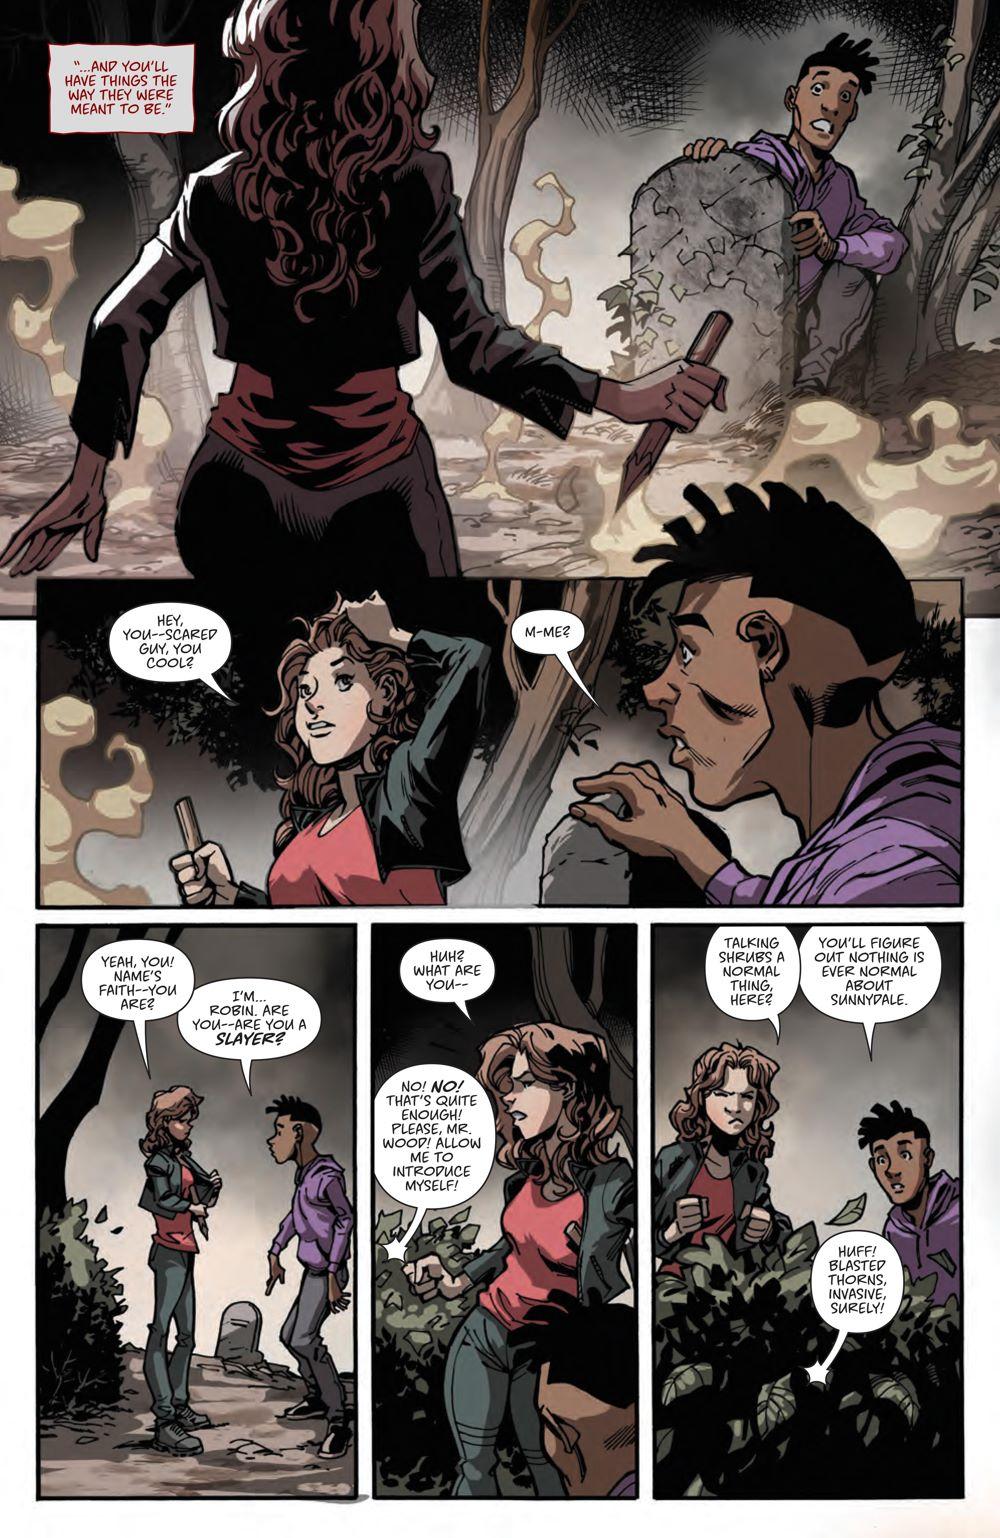 Buffy_020_PRESS_7 ComicList Previews: BUFFY THE VAMPIRE SLAYER #20